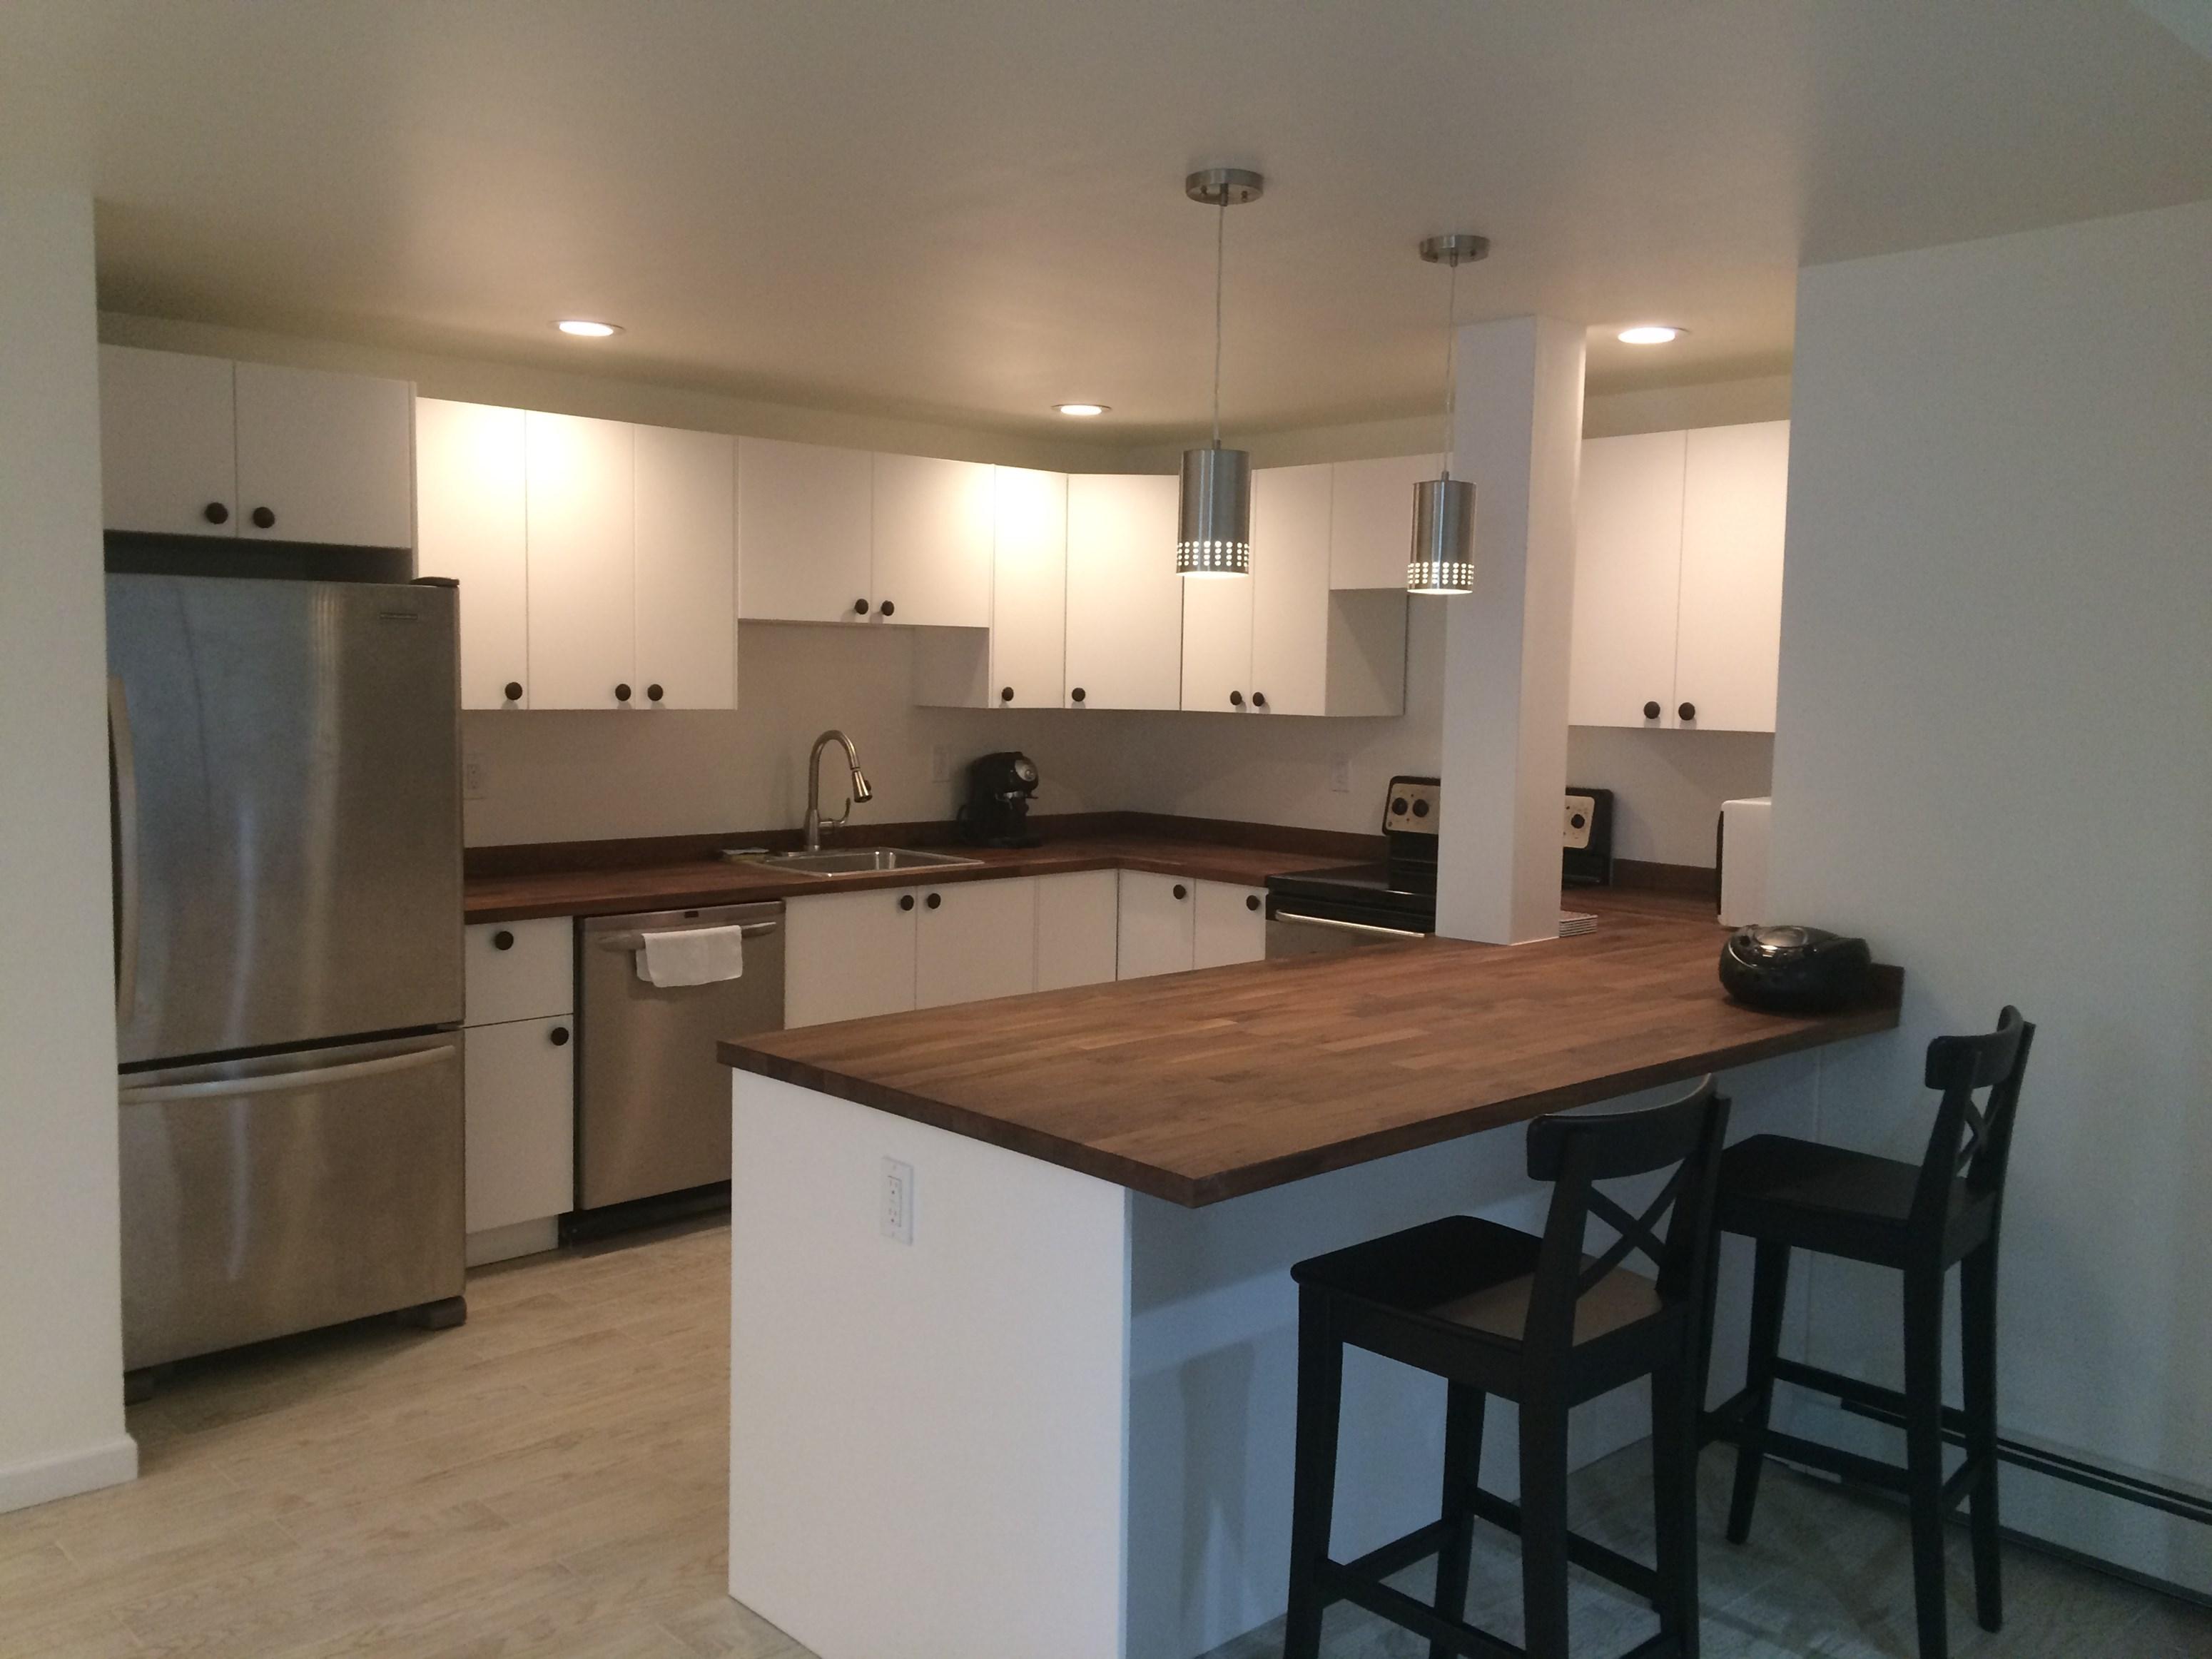 new diamond basement apartment in port jefferson stn north shore - Basement Apartments